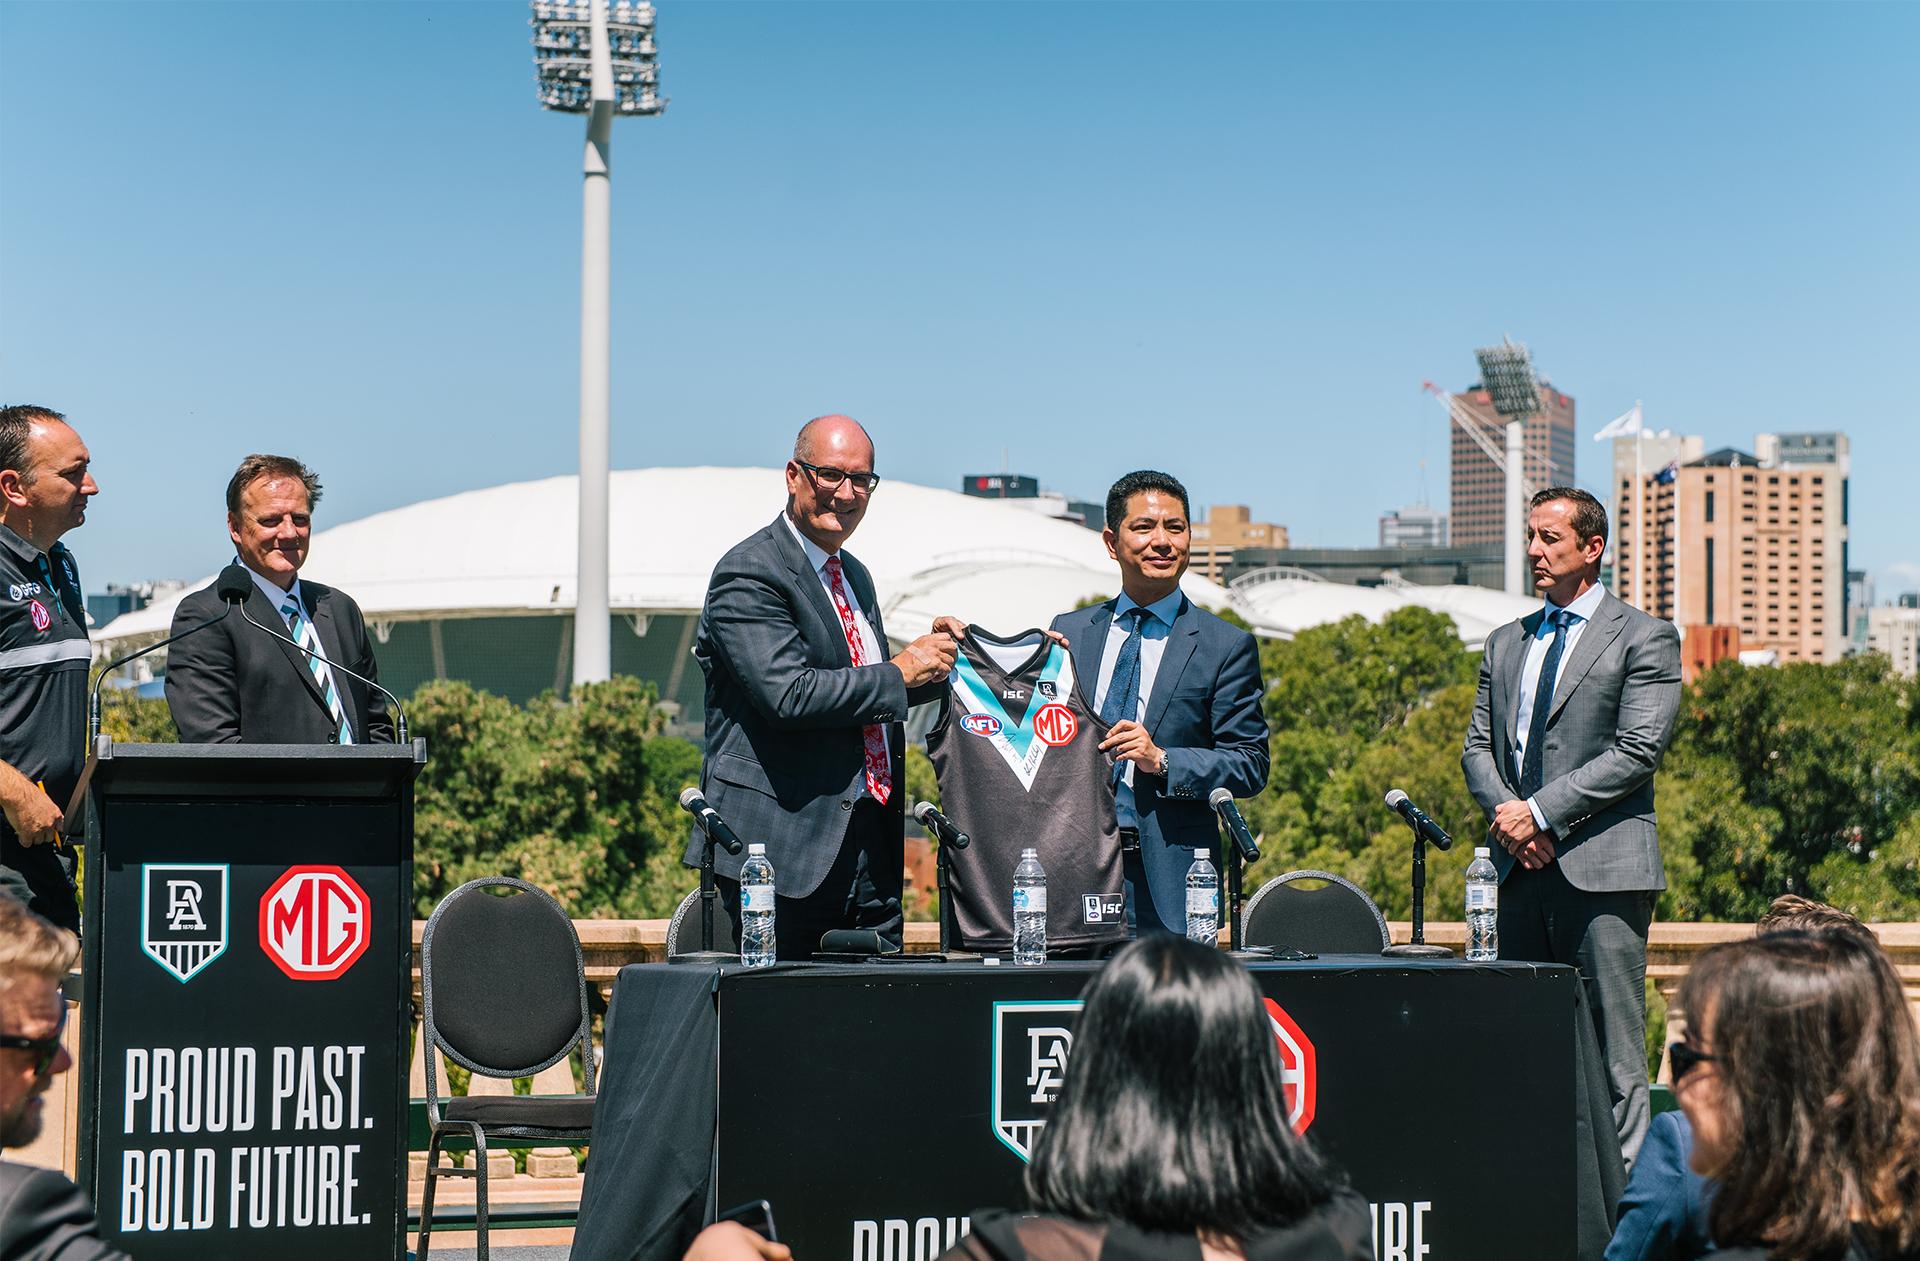 MG Motor Australia strikes multi-year partnership with Port Adelaide FC